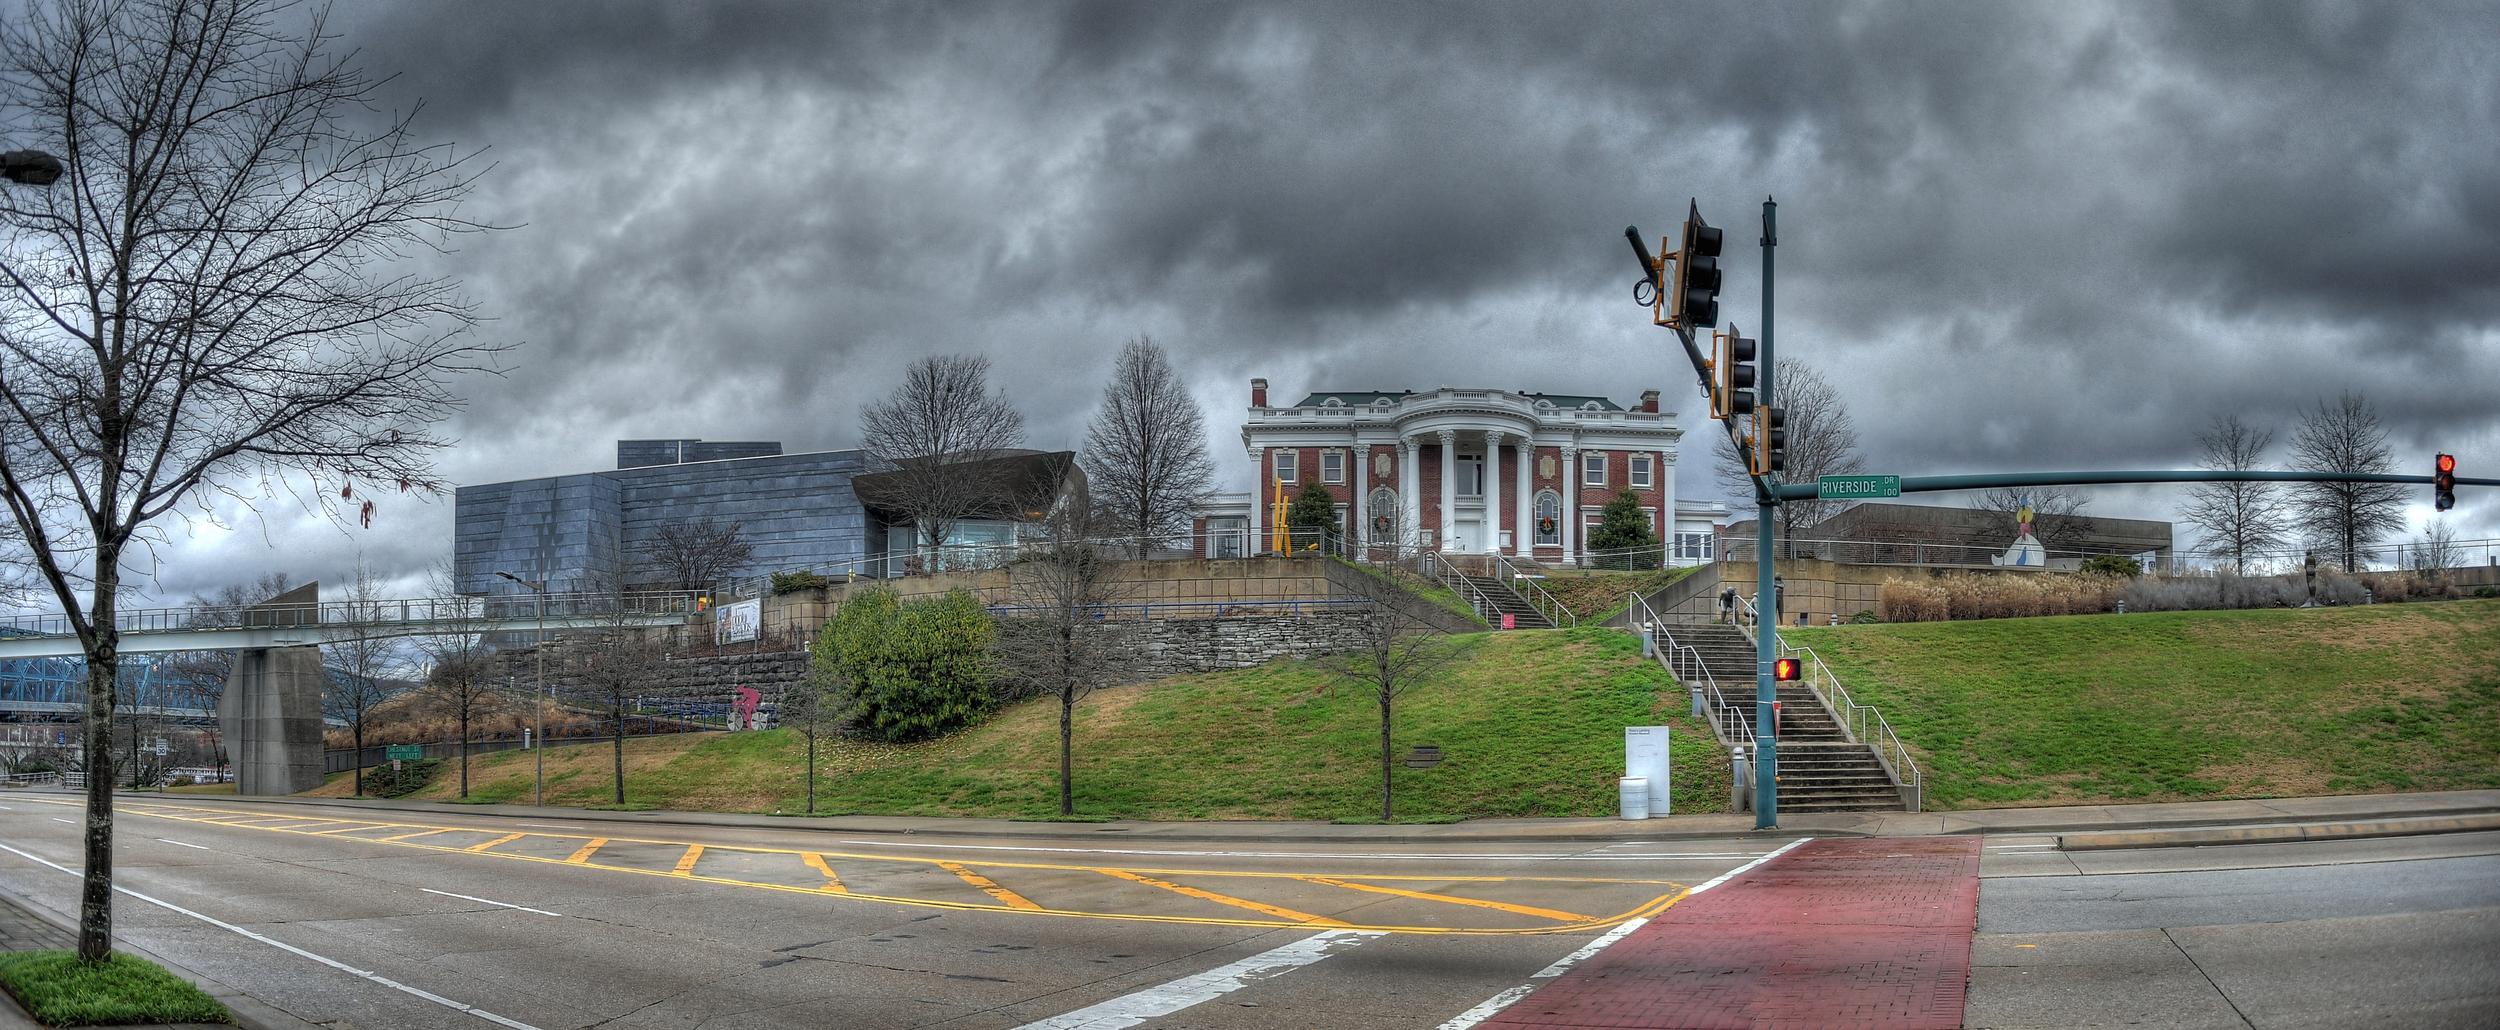 The Hunter Art Museum, Chattanooga, TN